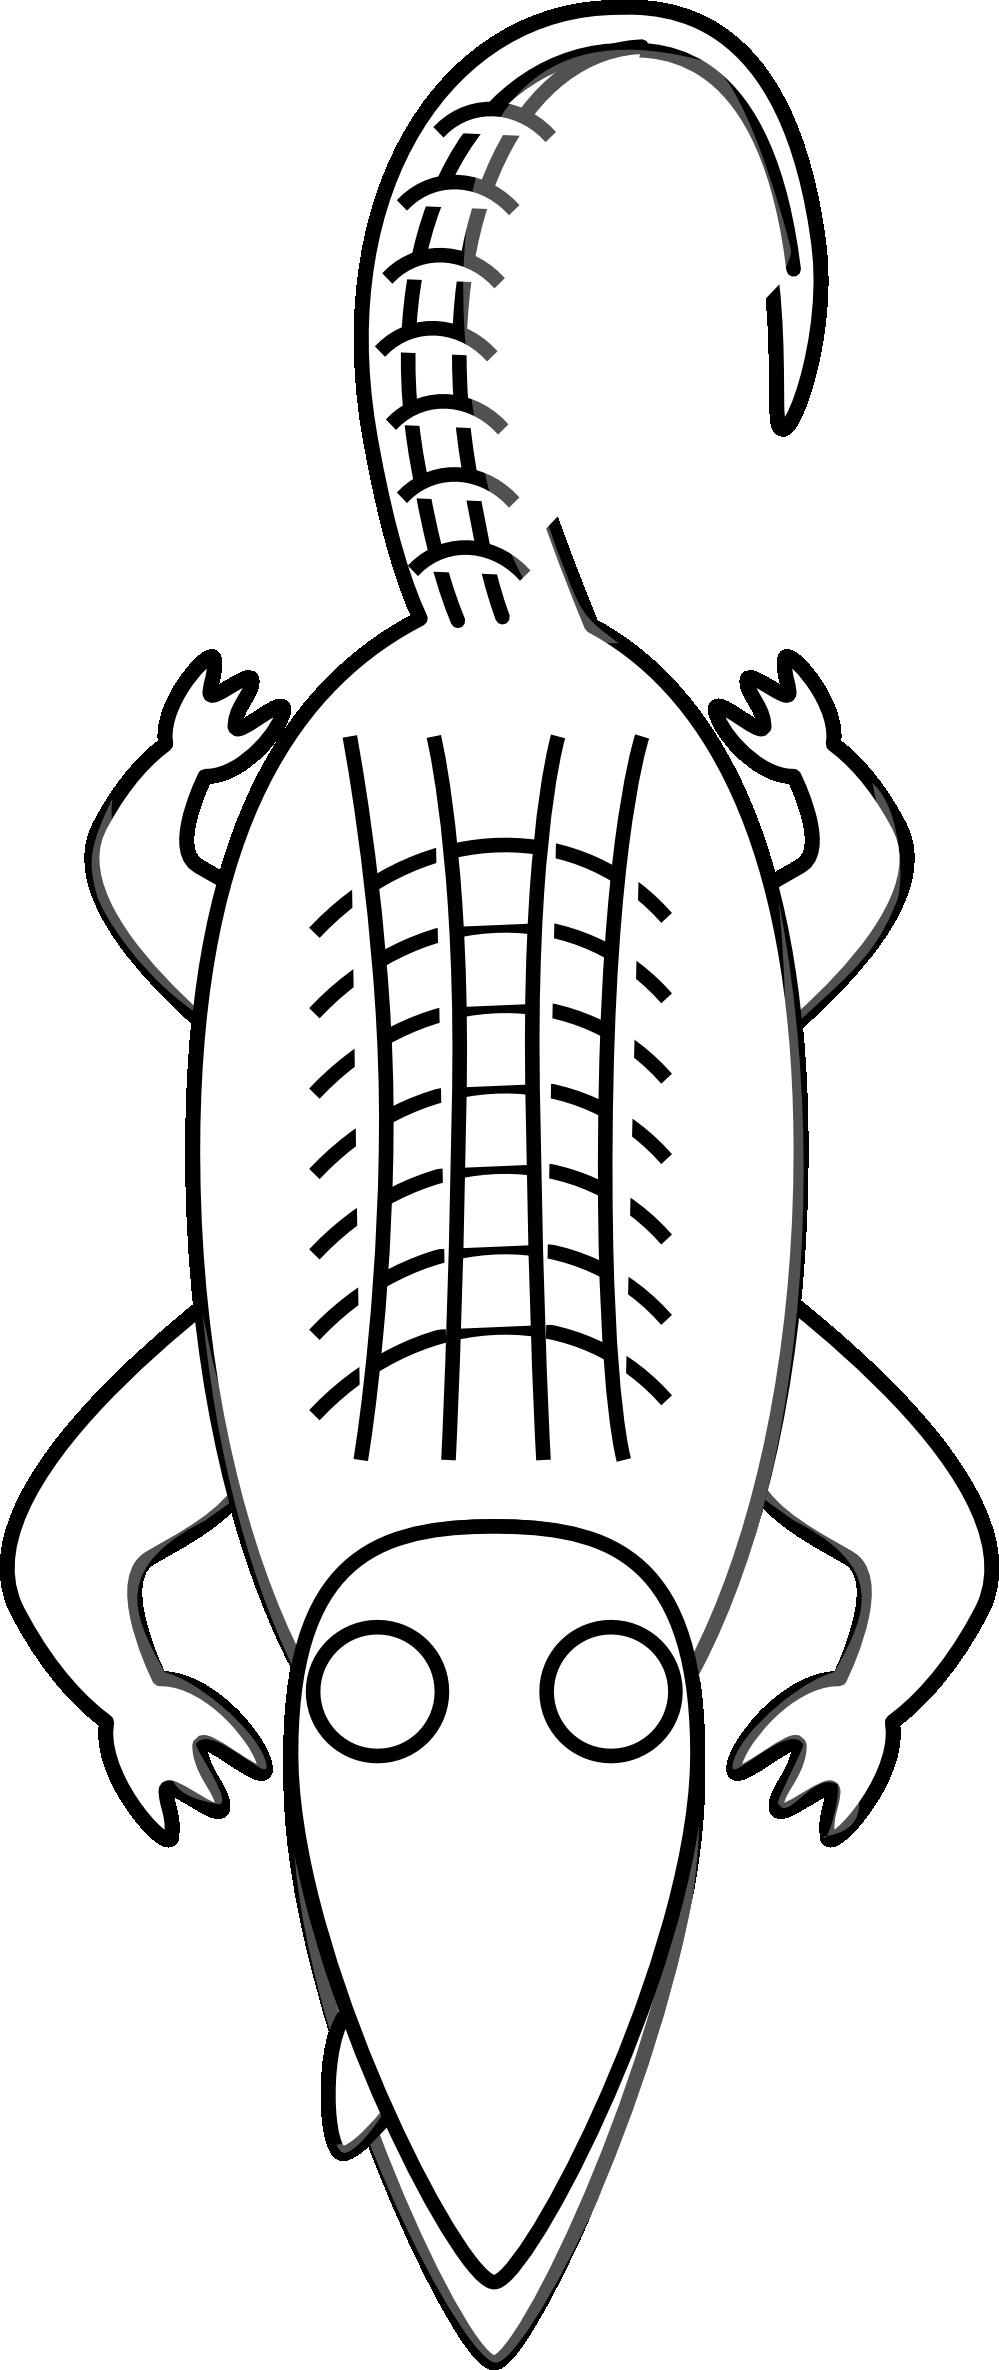 Alligator  black and white alligator clipart black and white free